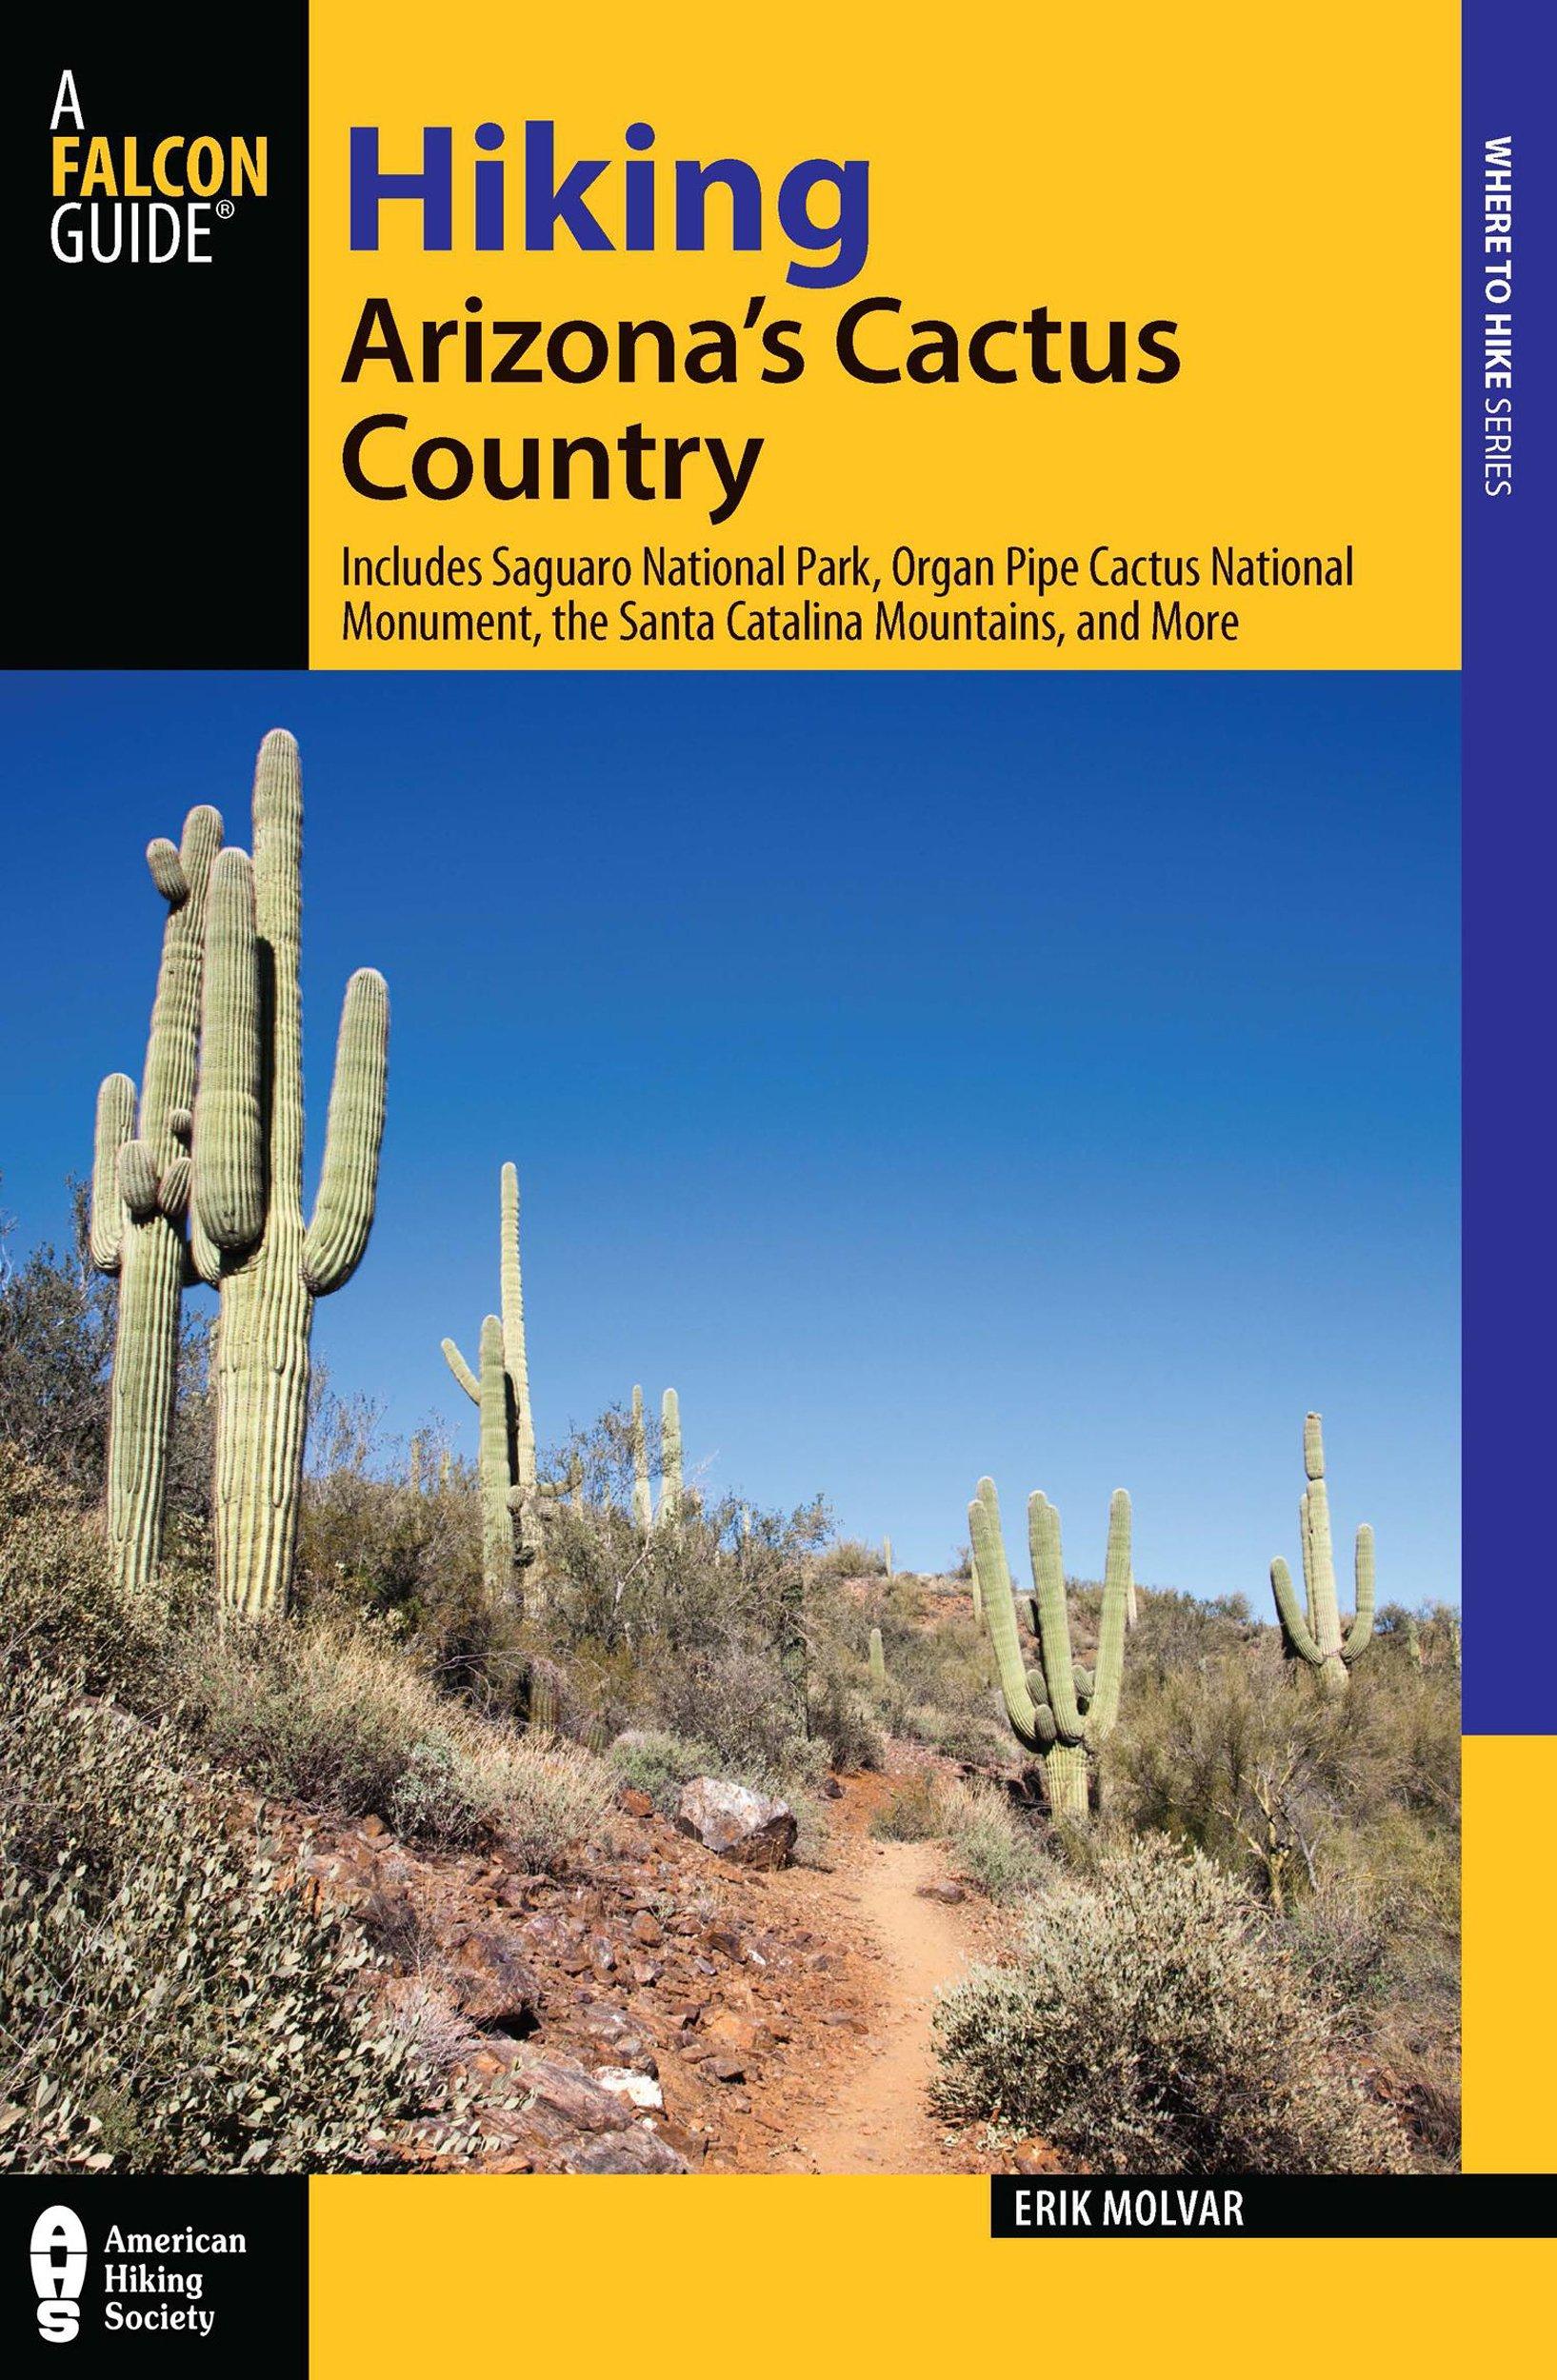 Hiking Arizona's Cactus Country: Includes Saguaro National Park, Organ Pipe Cactus National Monument, The Santa Catalina Mountains, And More (Regional Hiking Series) pdf epub